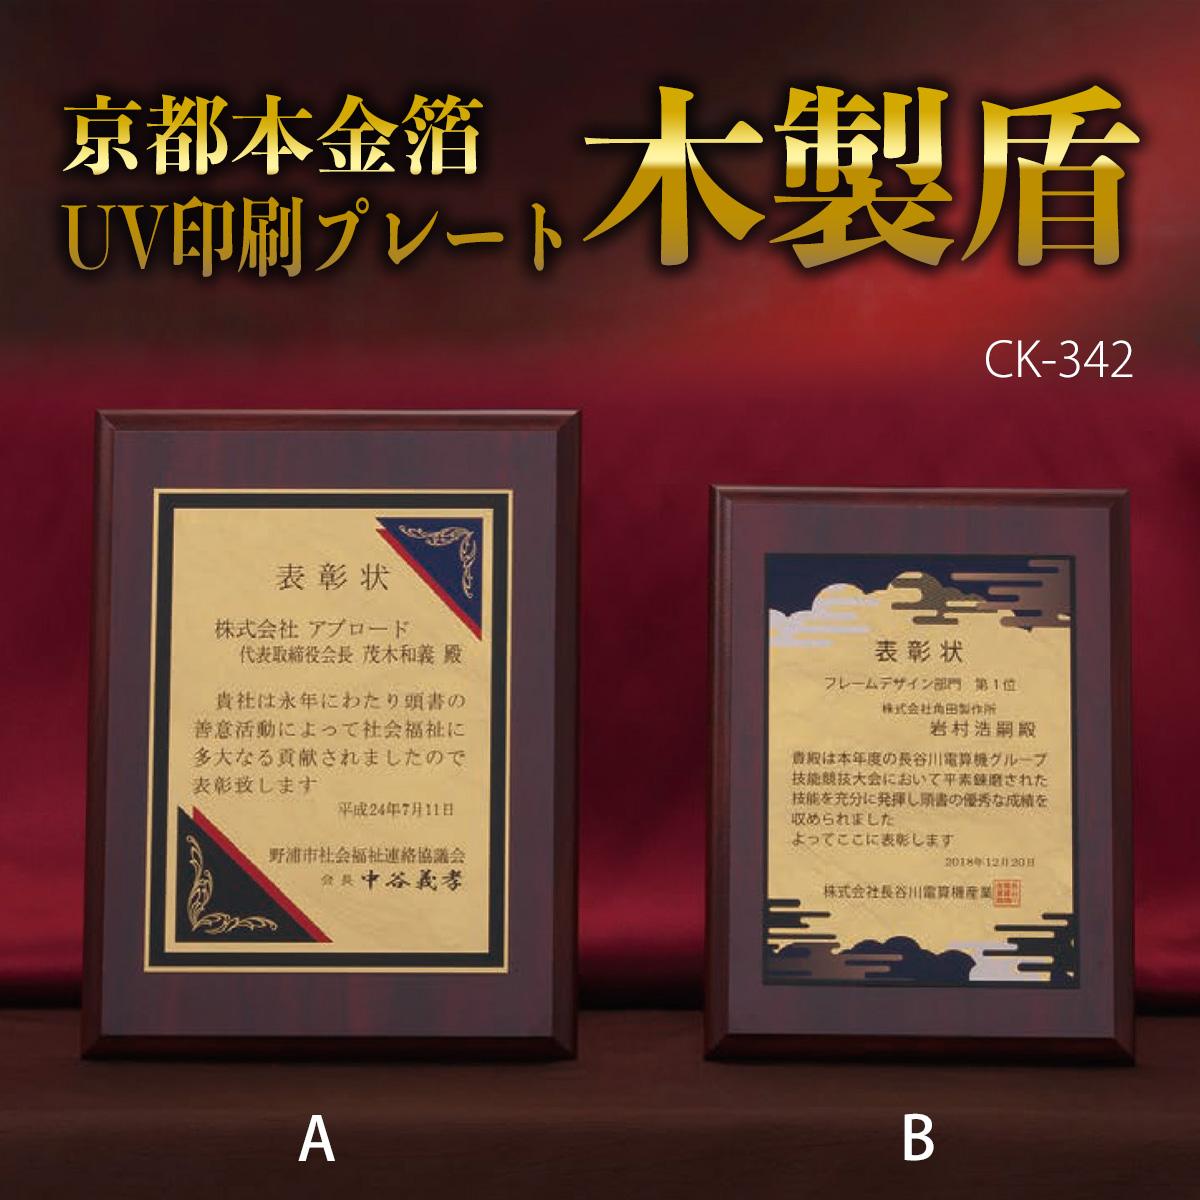 京都本金箔 UV印刷プレート木製盾 CK-342画像